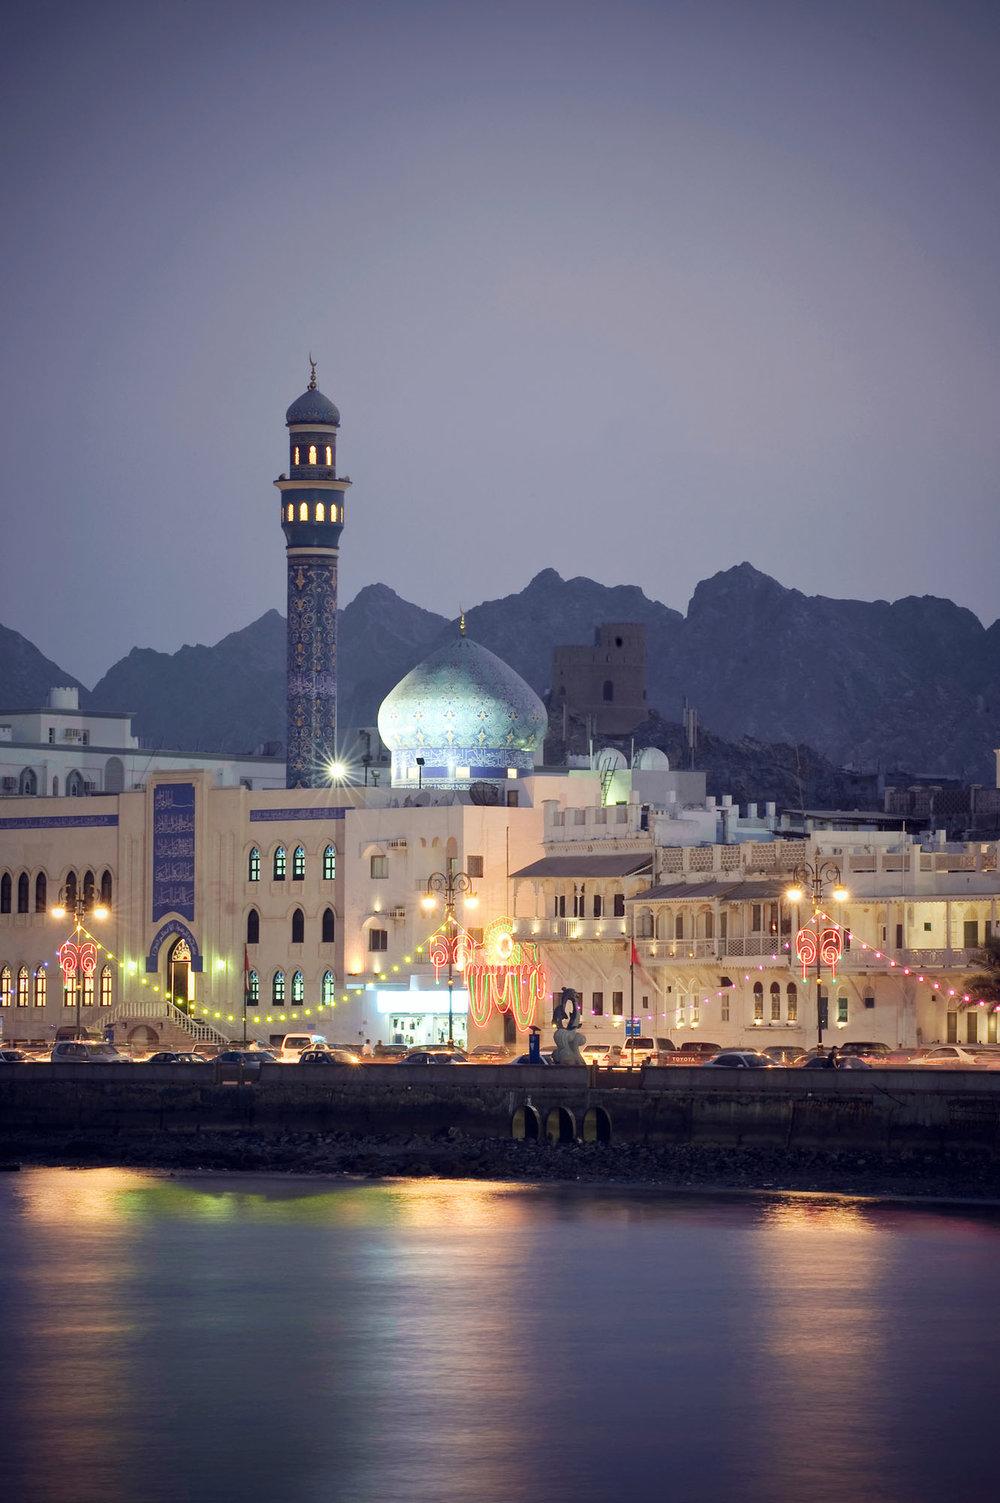 Muttrah city - Oman